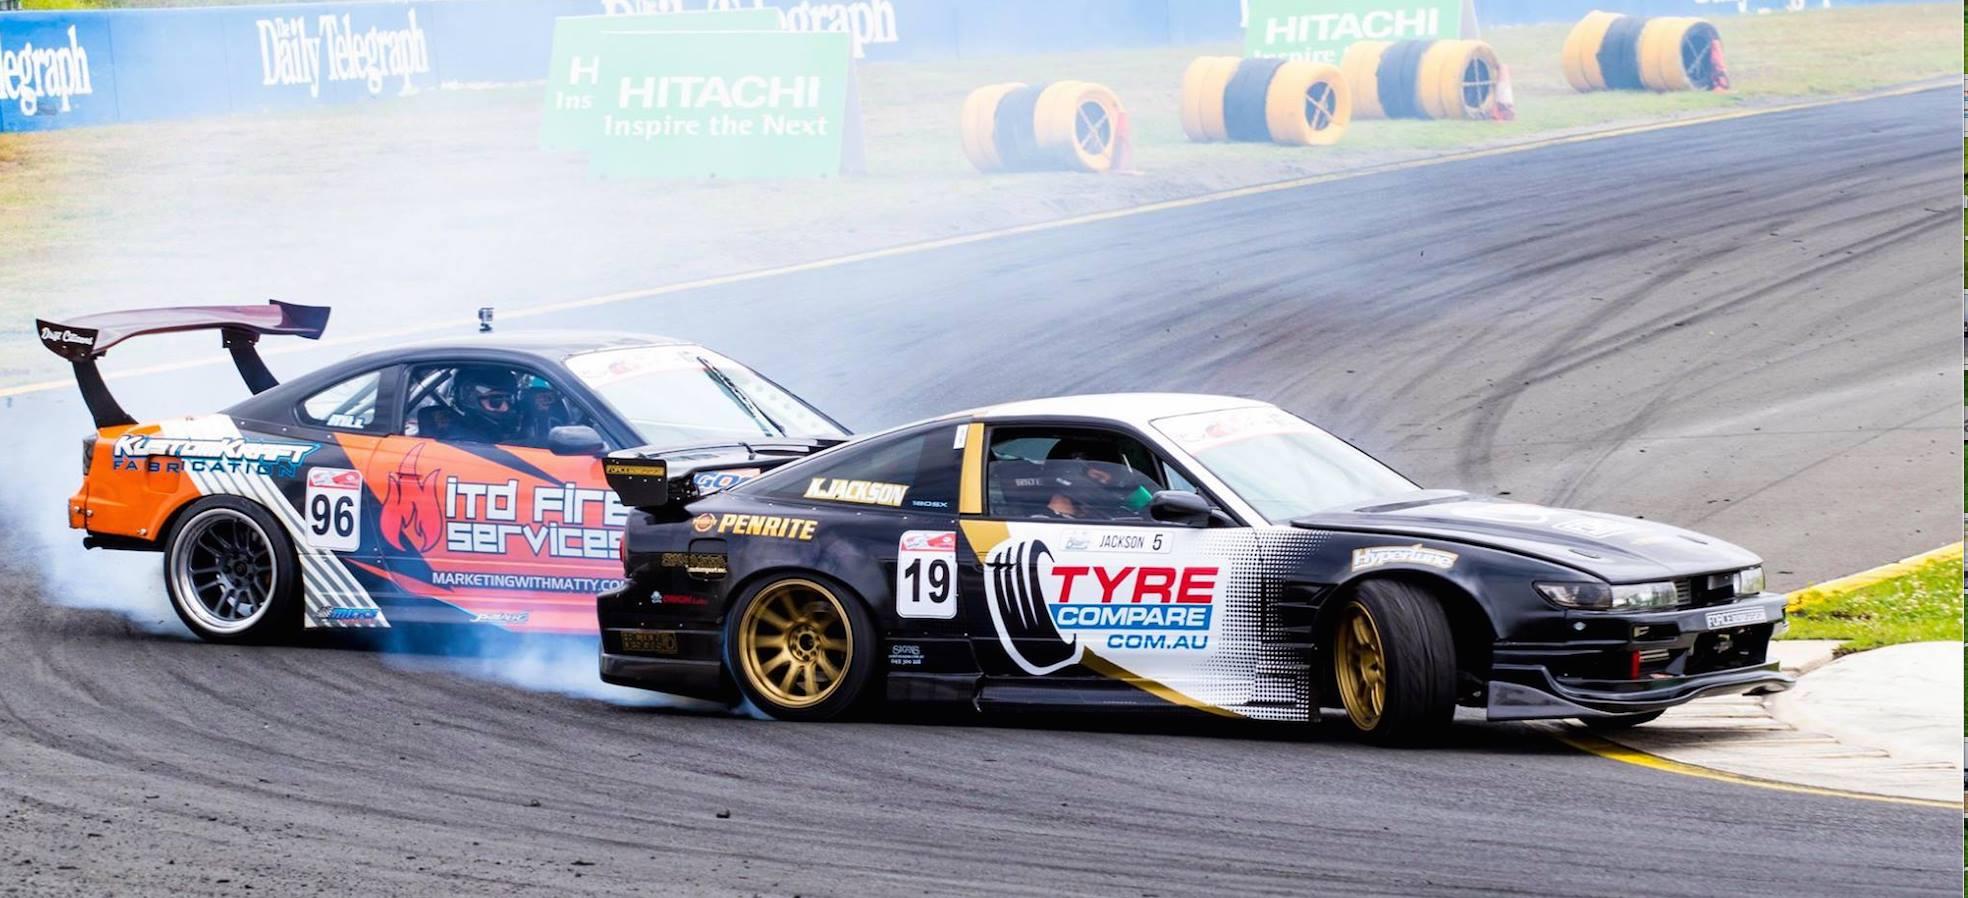 Drift car tyre compare